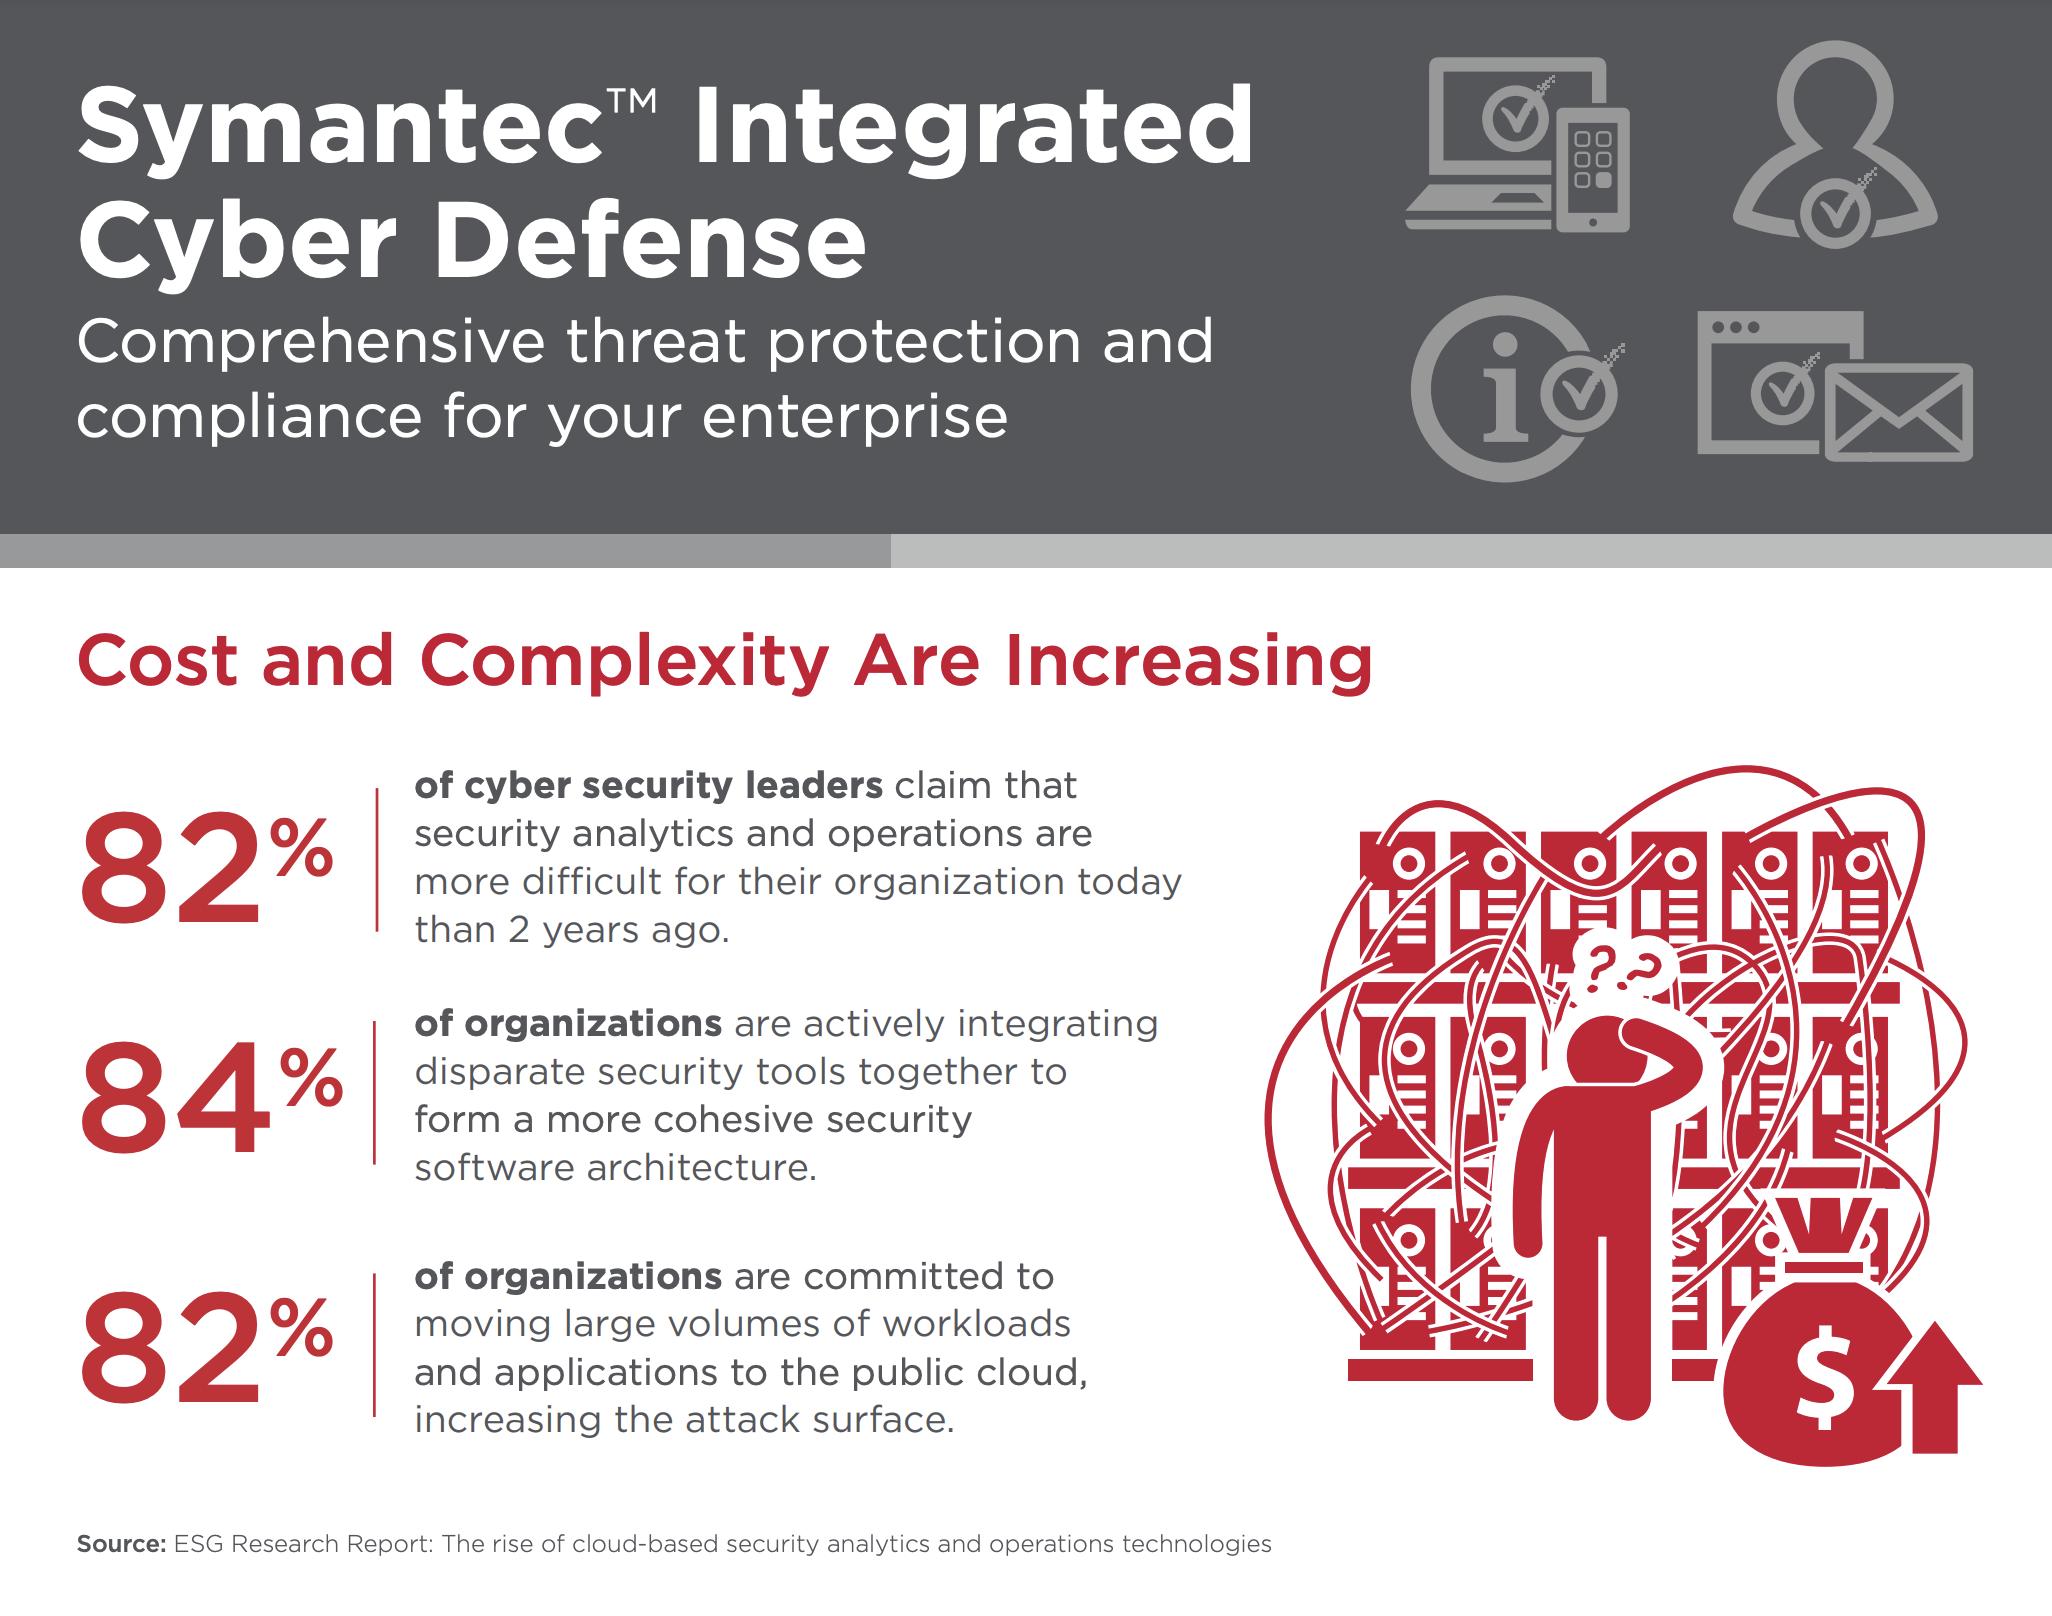 Symantec integrated cyber defense